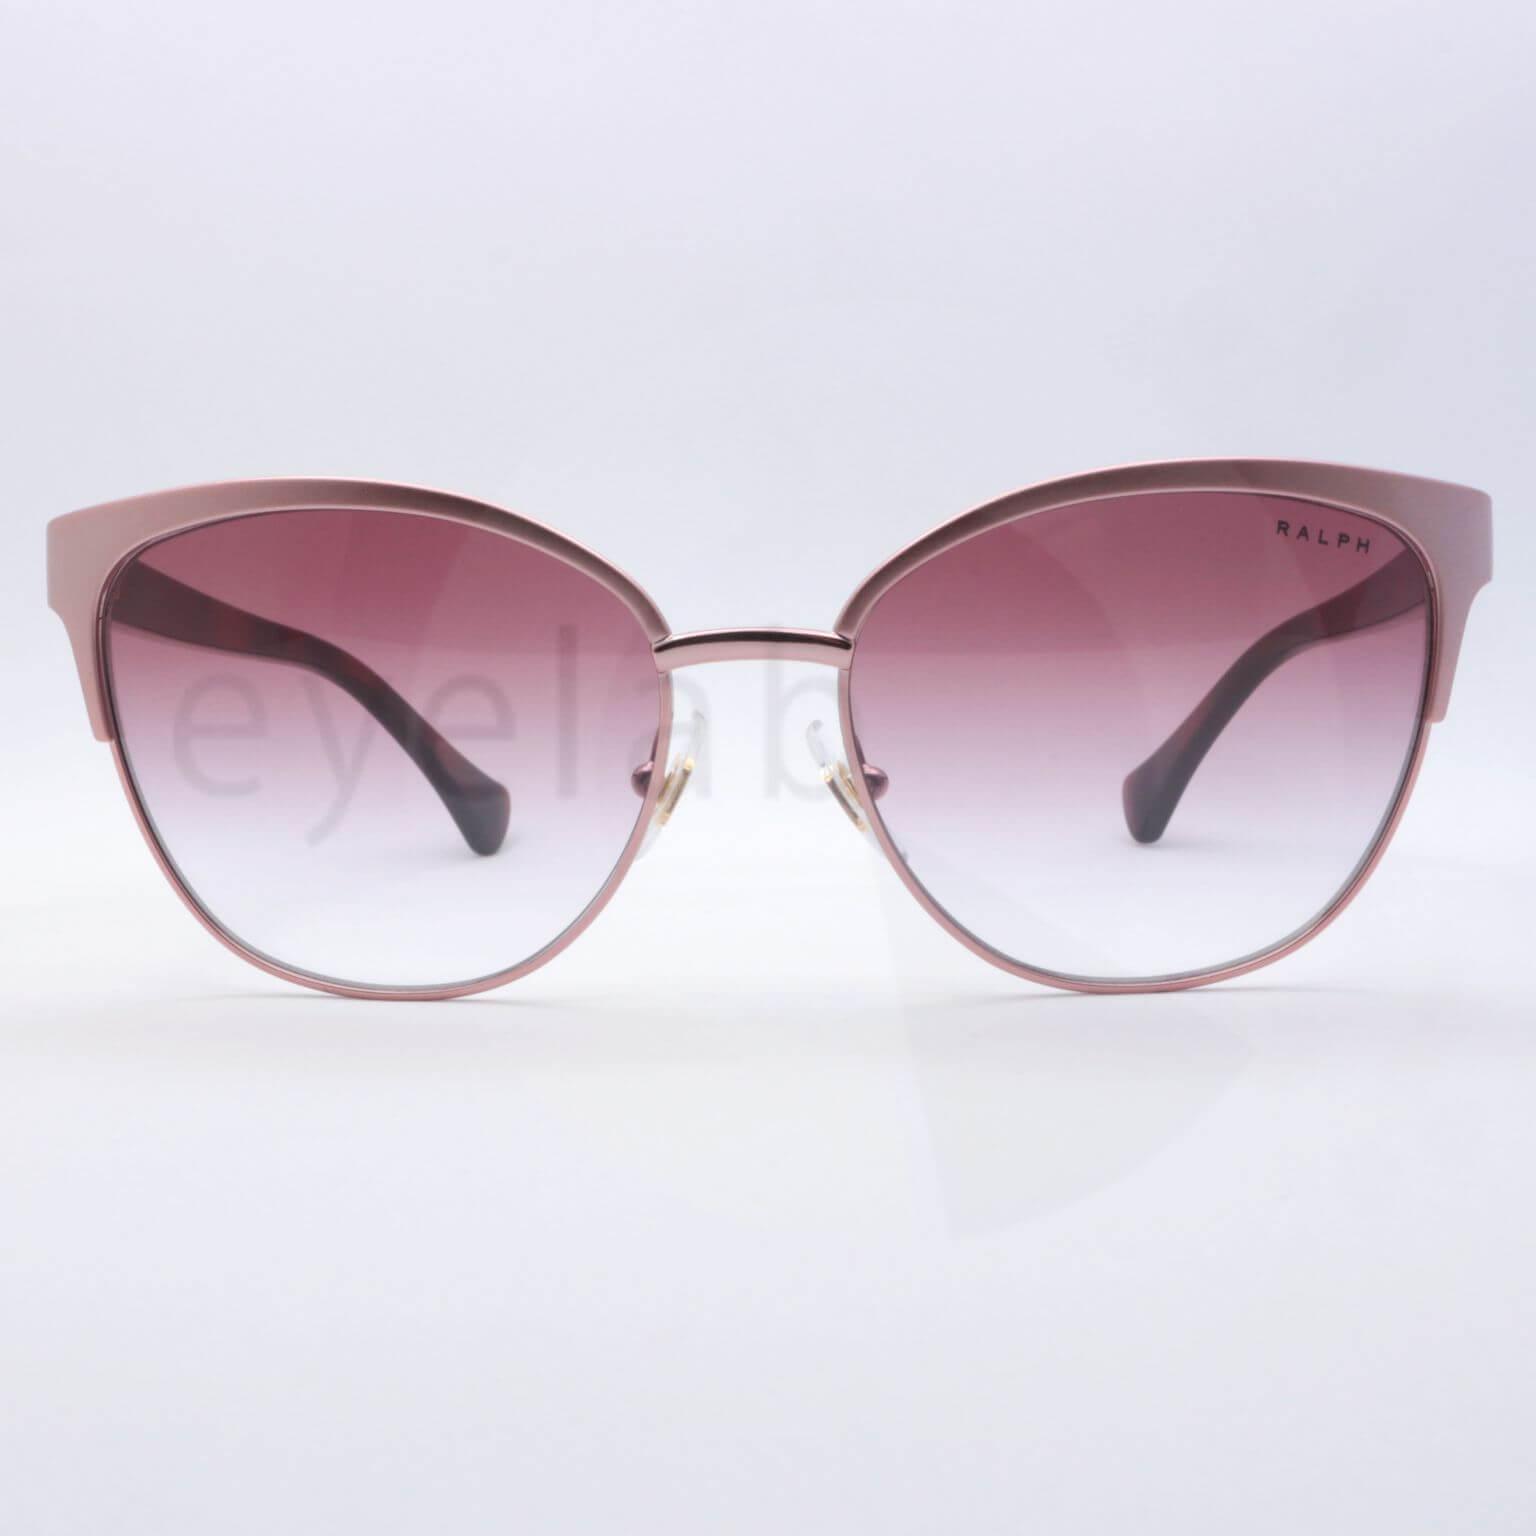 dc1c55ff66 Γυαλιά ηλίου Ralph by Ralph Lauren 4127 90958H ~ Eyelab